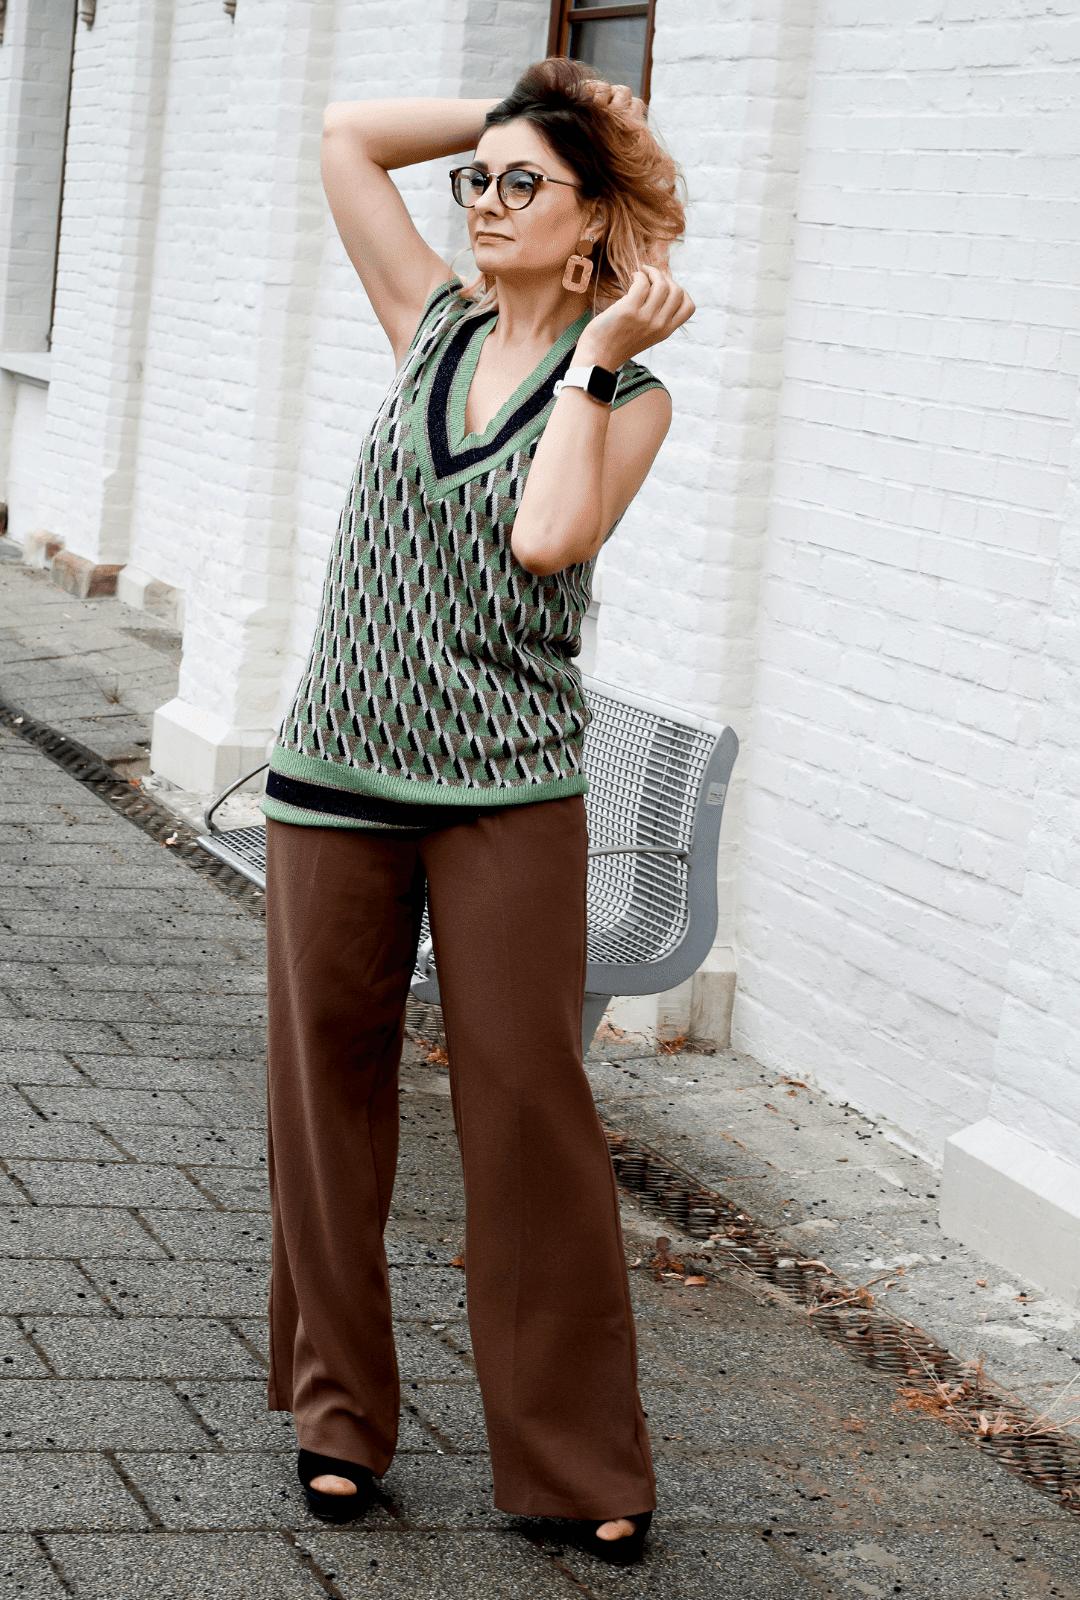 Braun-kombinieren-Outfit-Marlenehose